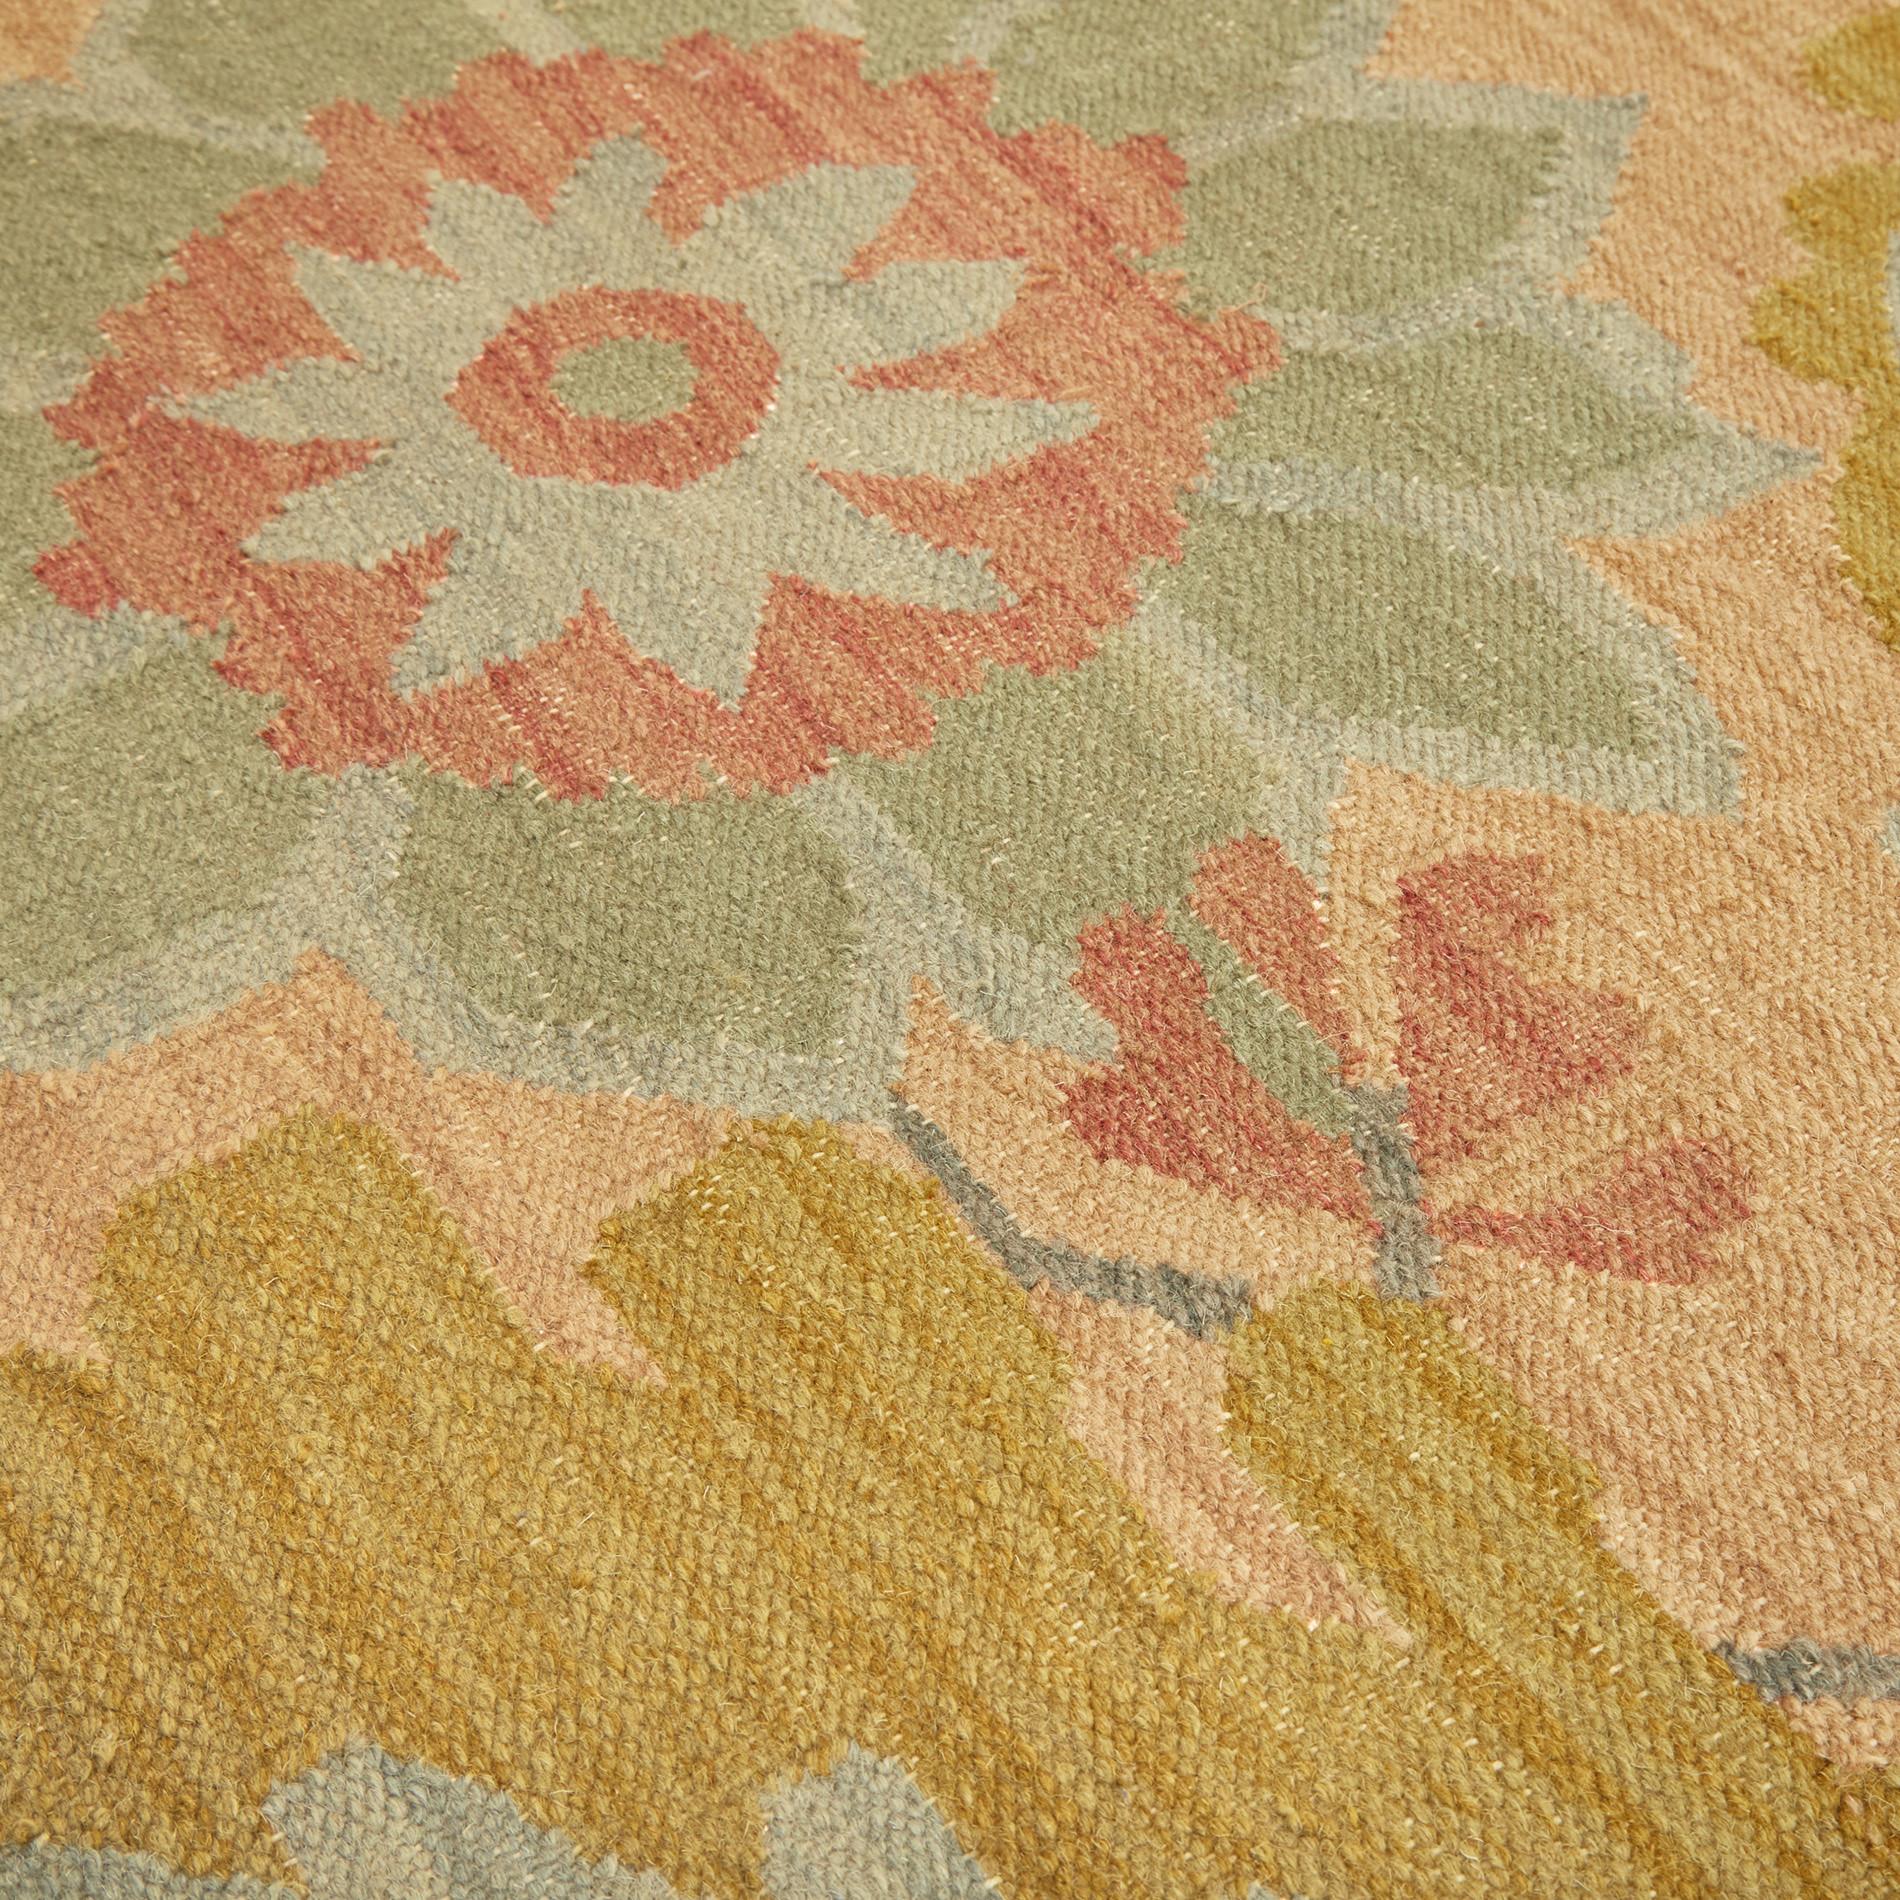 Tappeto in lana e cotone motivo floreale, Multicolor, large image number 1